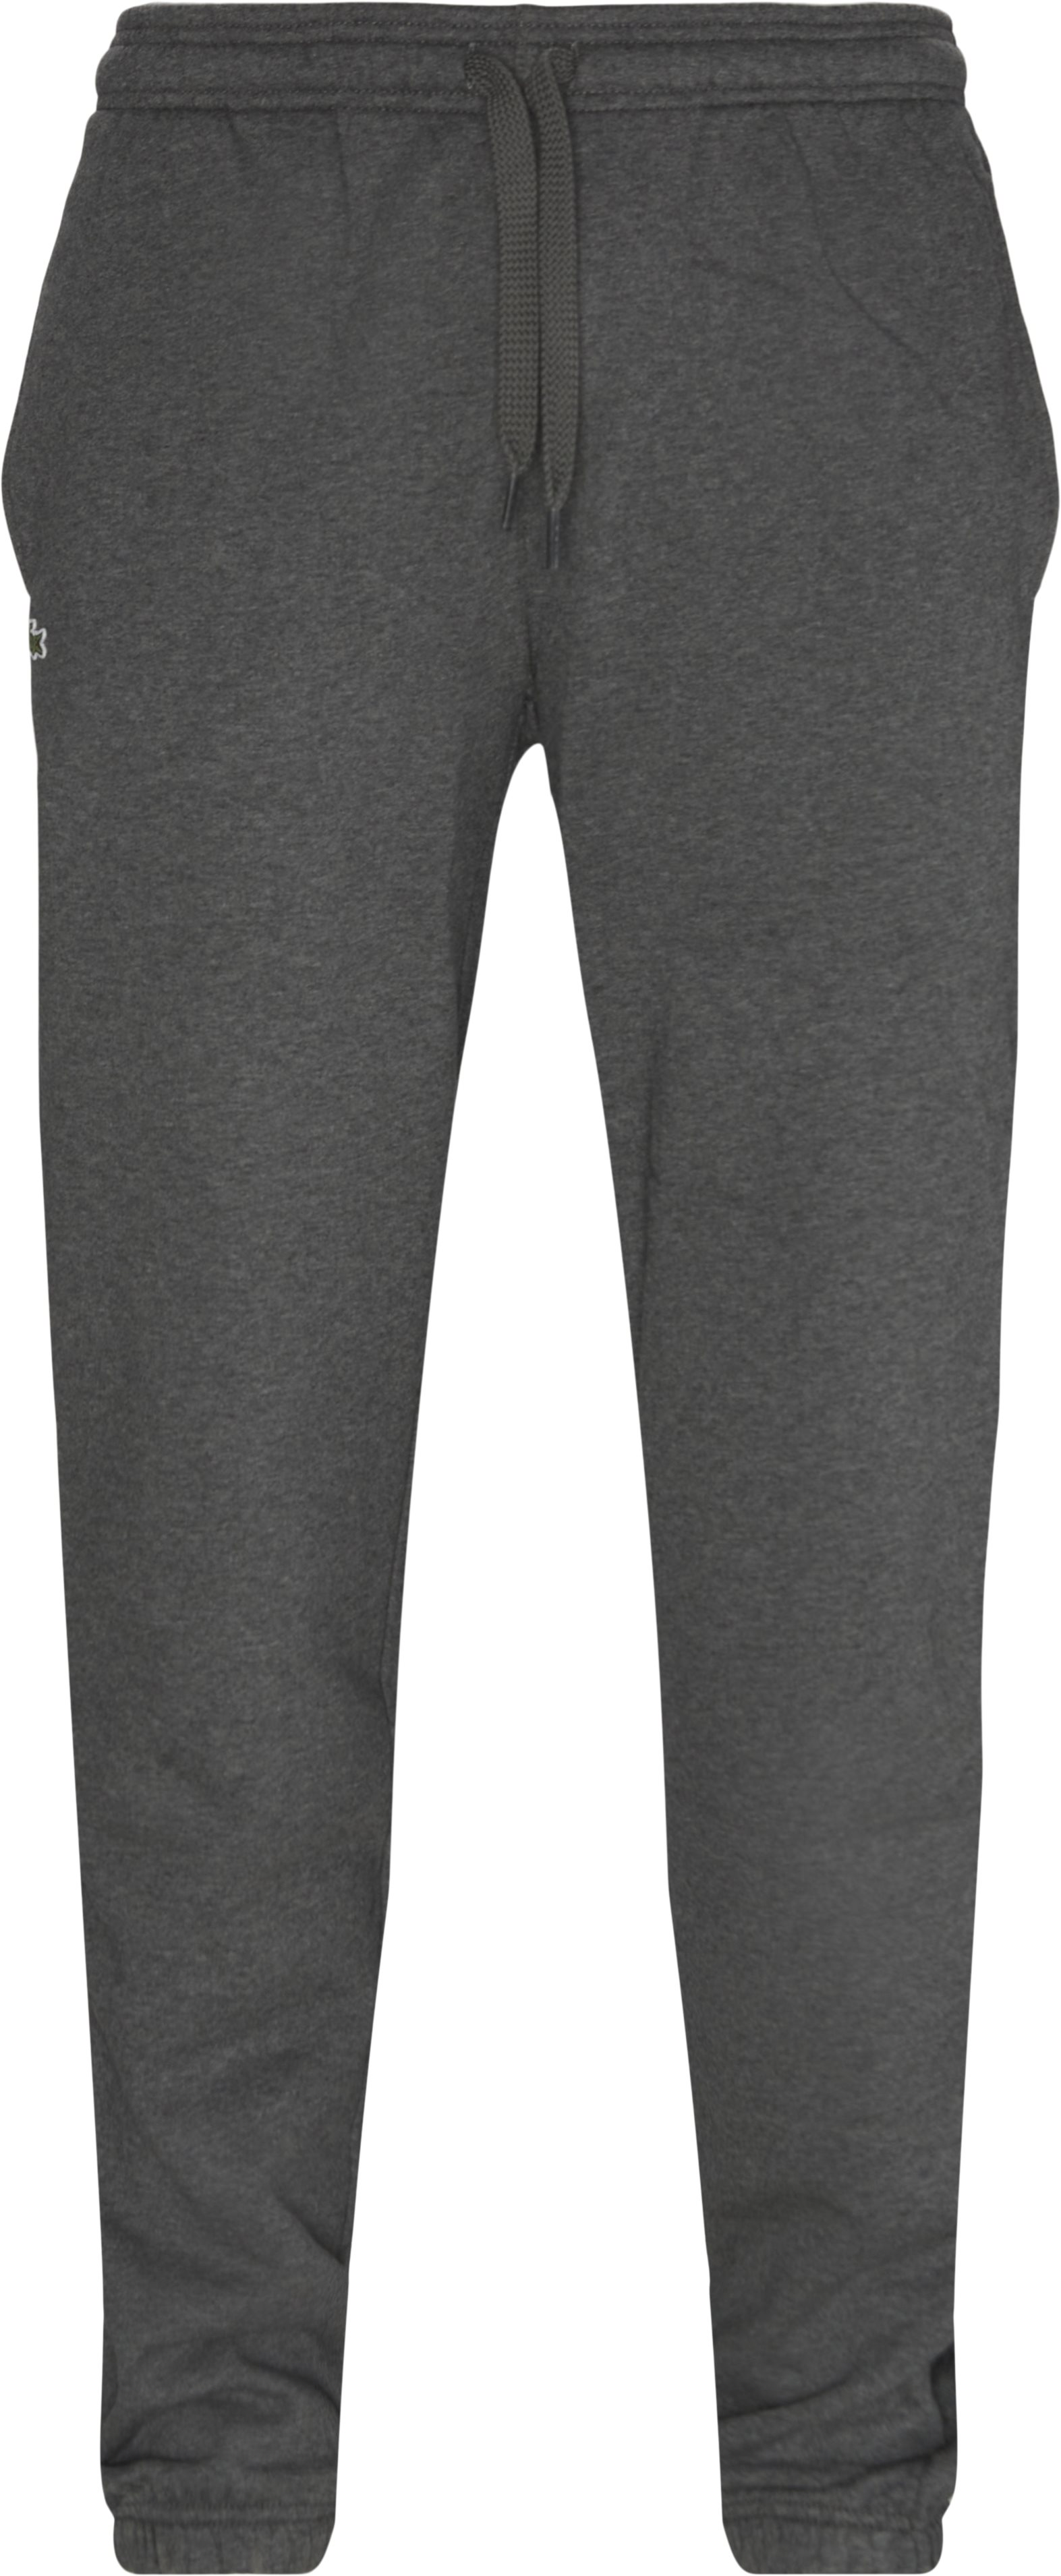 XH7611 Sweatpants - Bukser - Regular fit - Grå